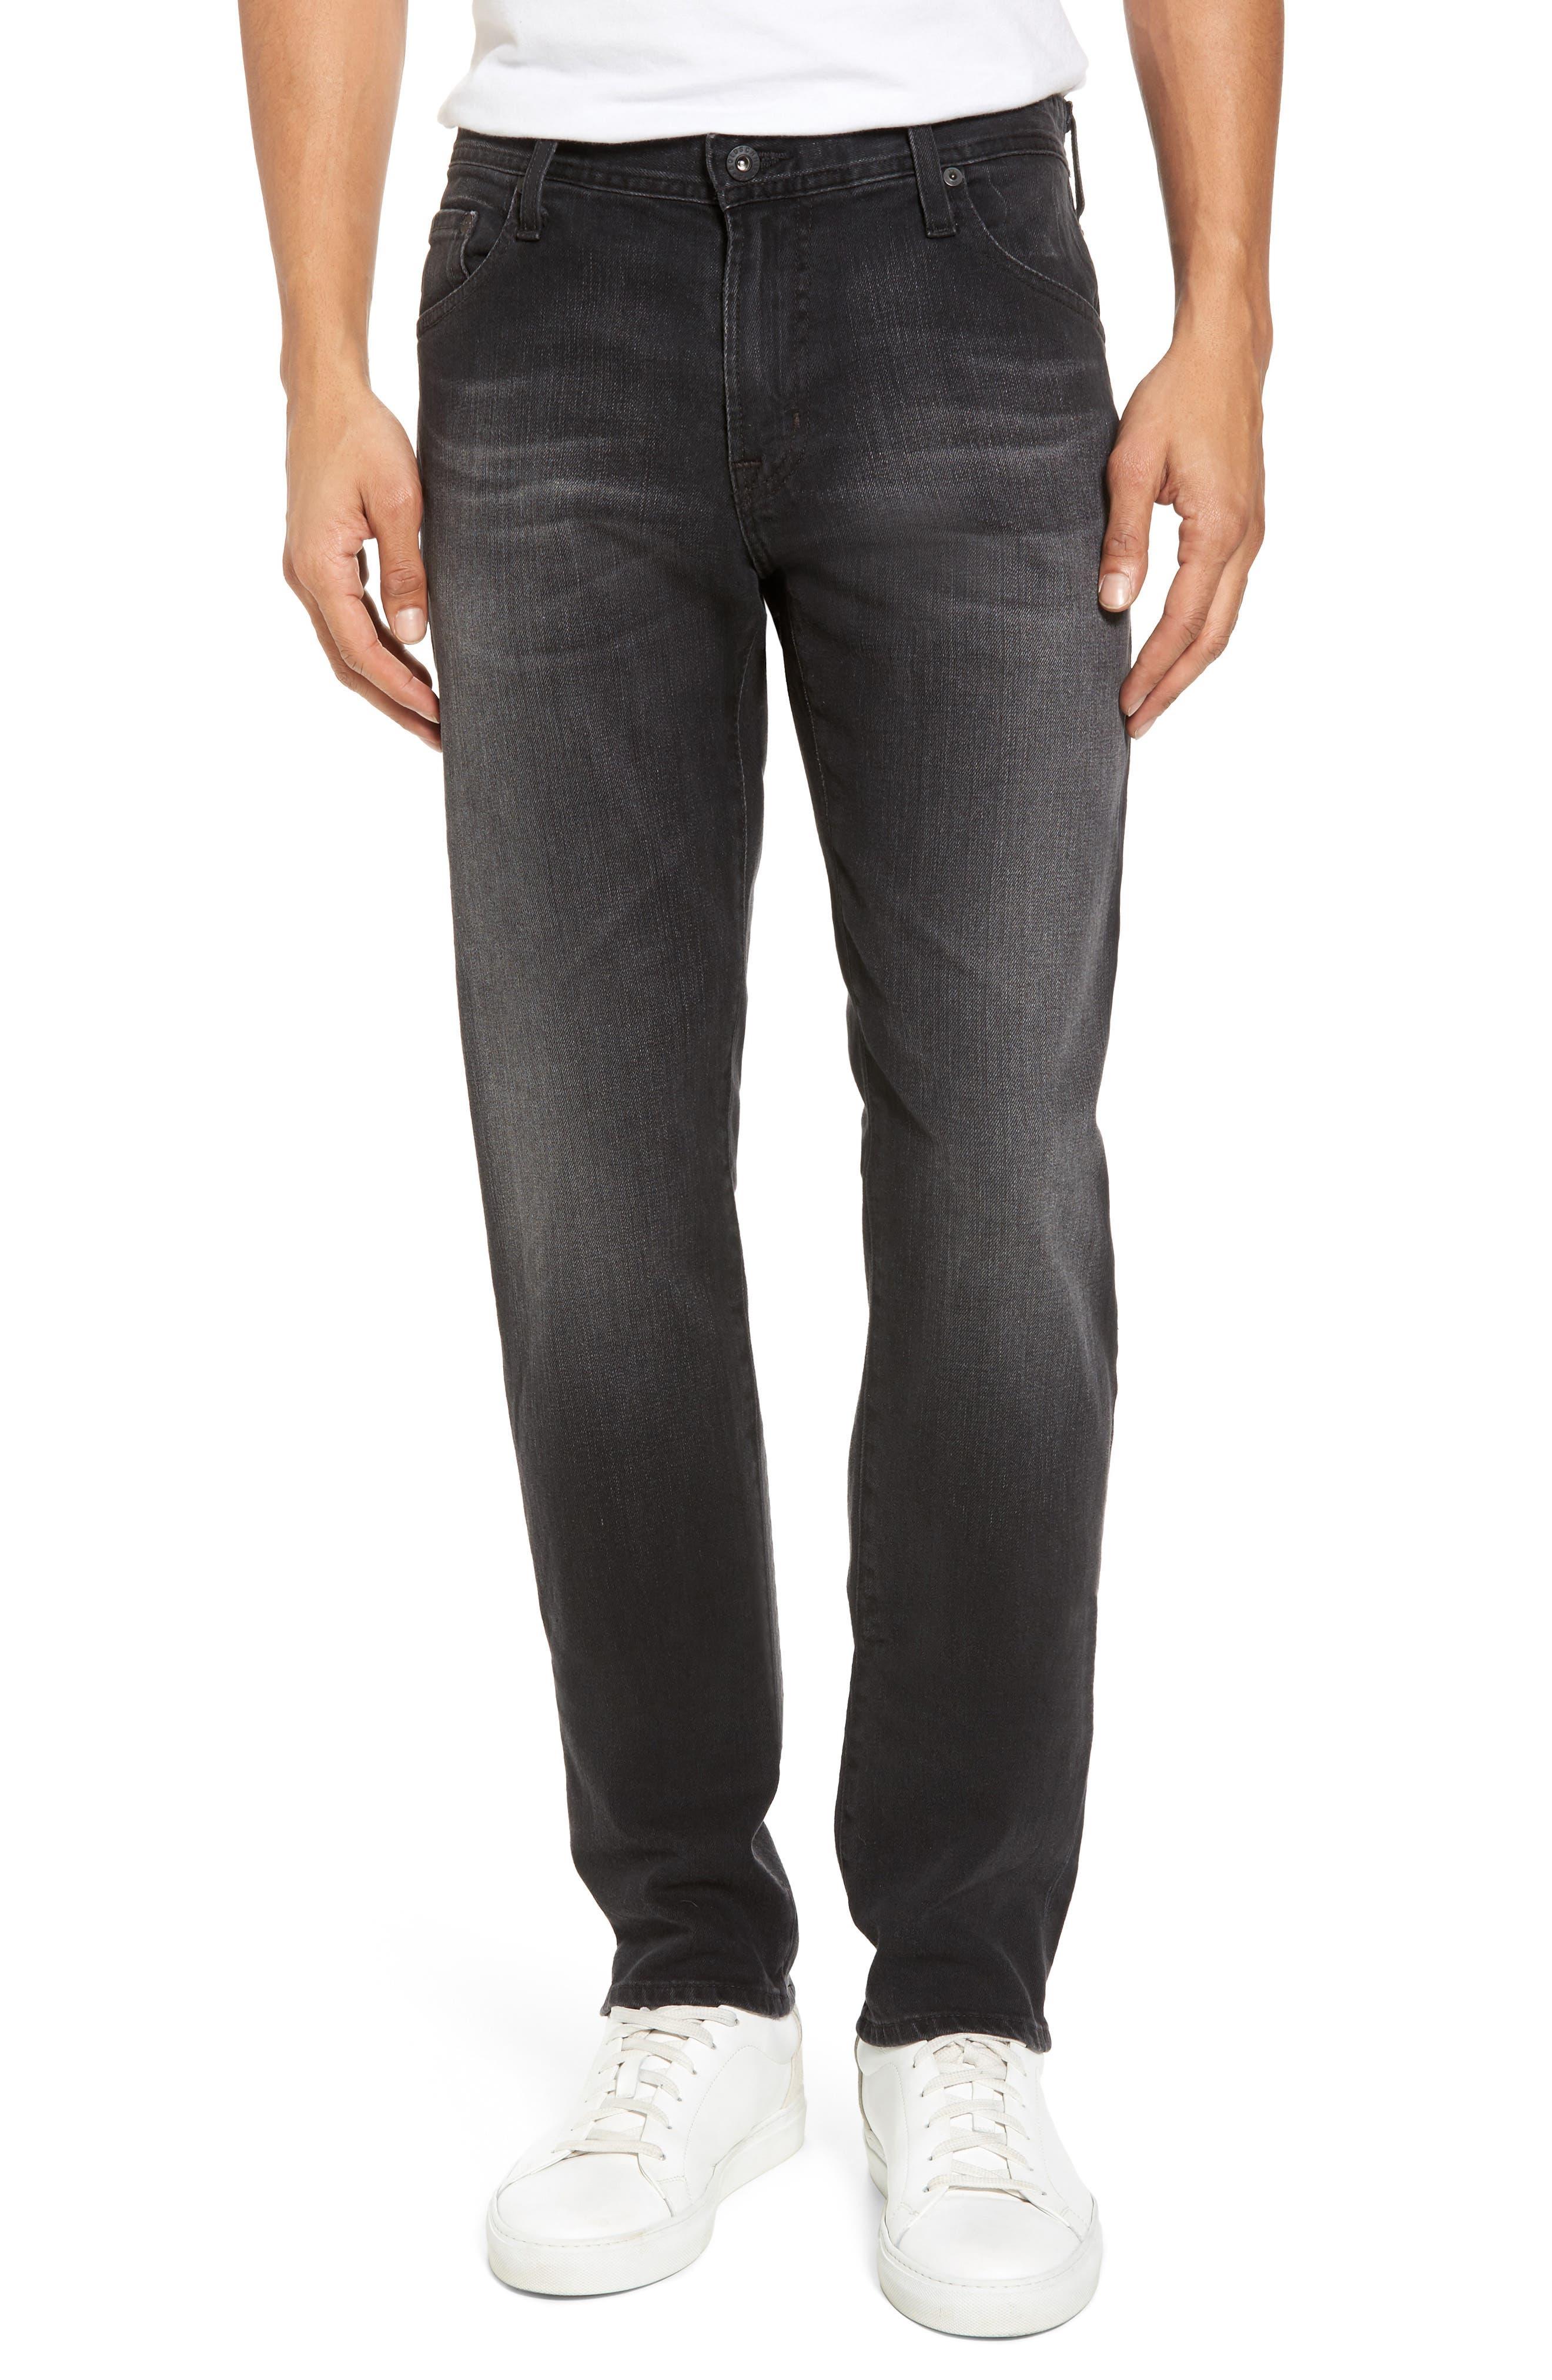 Tellis Modern Slim Fit Jeans,                         Main,                         color, Smudged Black